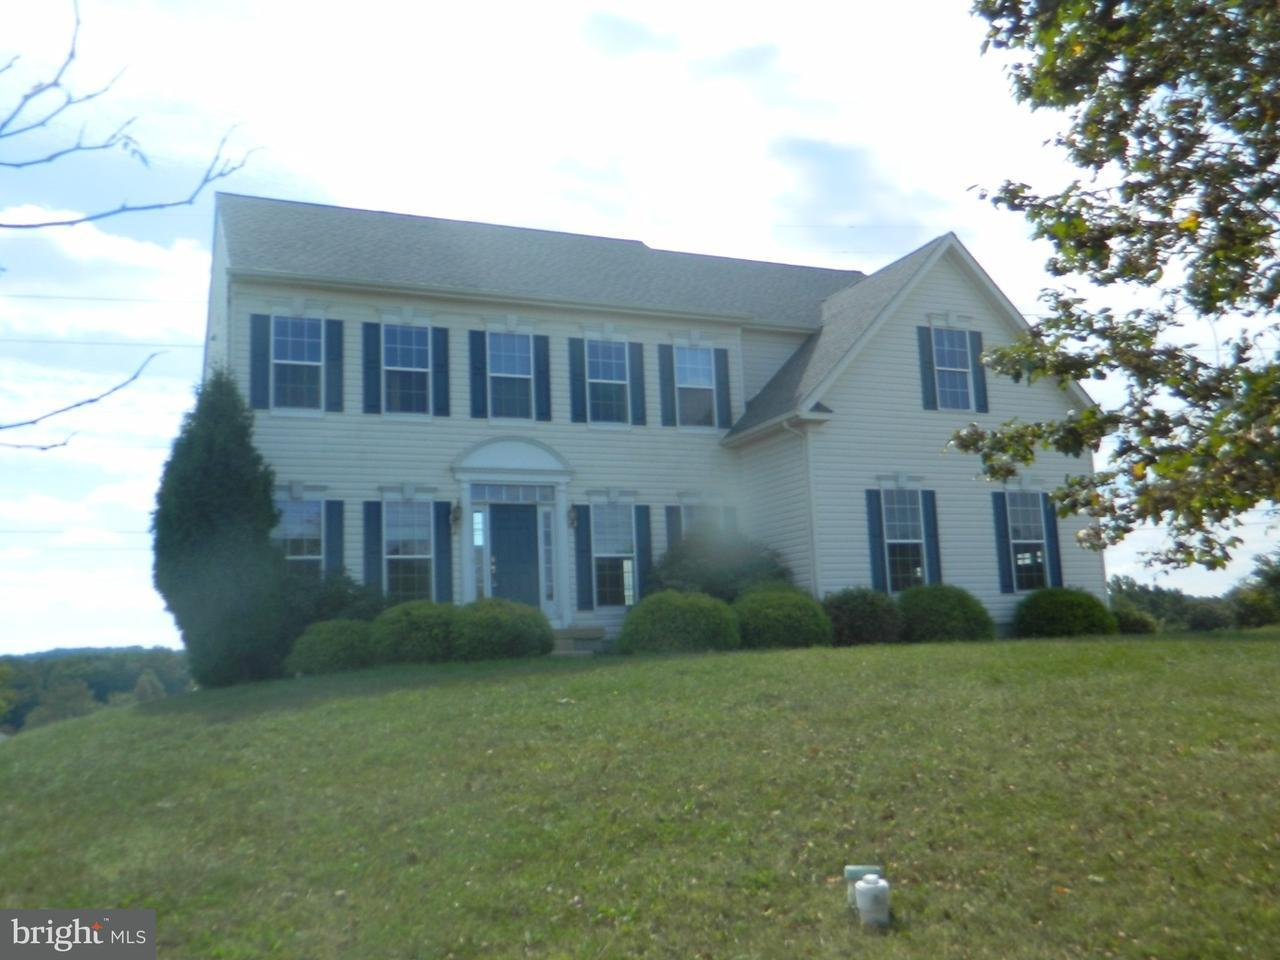 Single Family Home for Rent at 127 RIVERSIDE Lane Coatesville, Pennsylvania 19320 United States